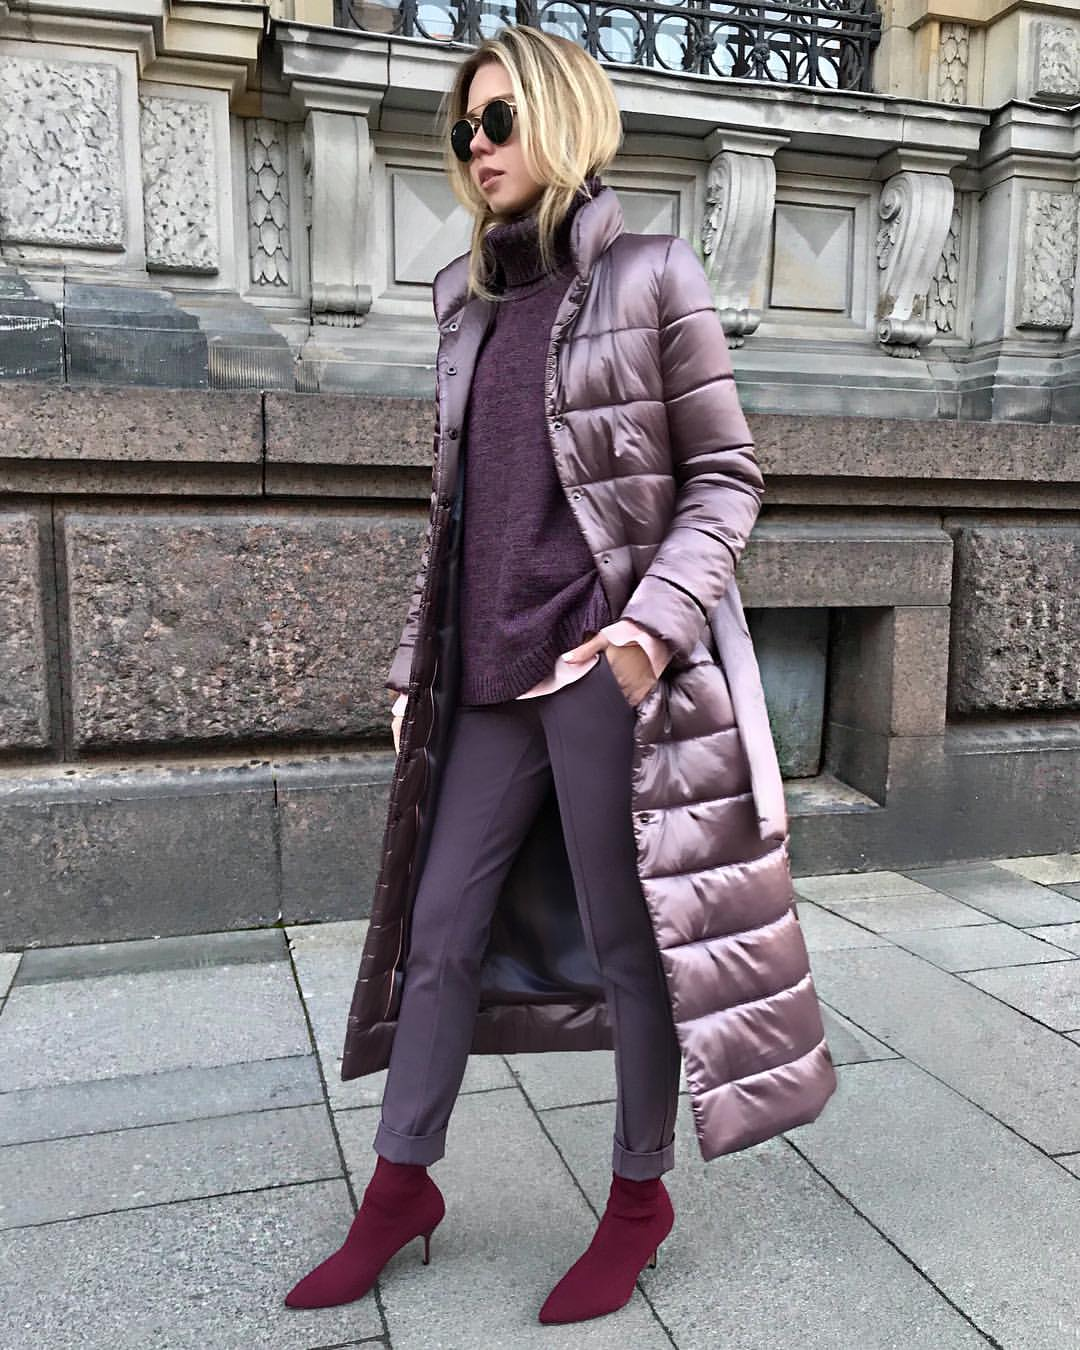 Modnyj_look-2019 (45)